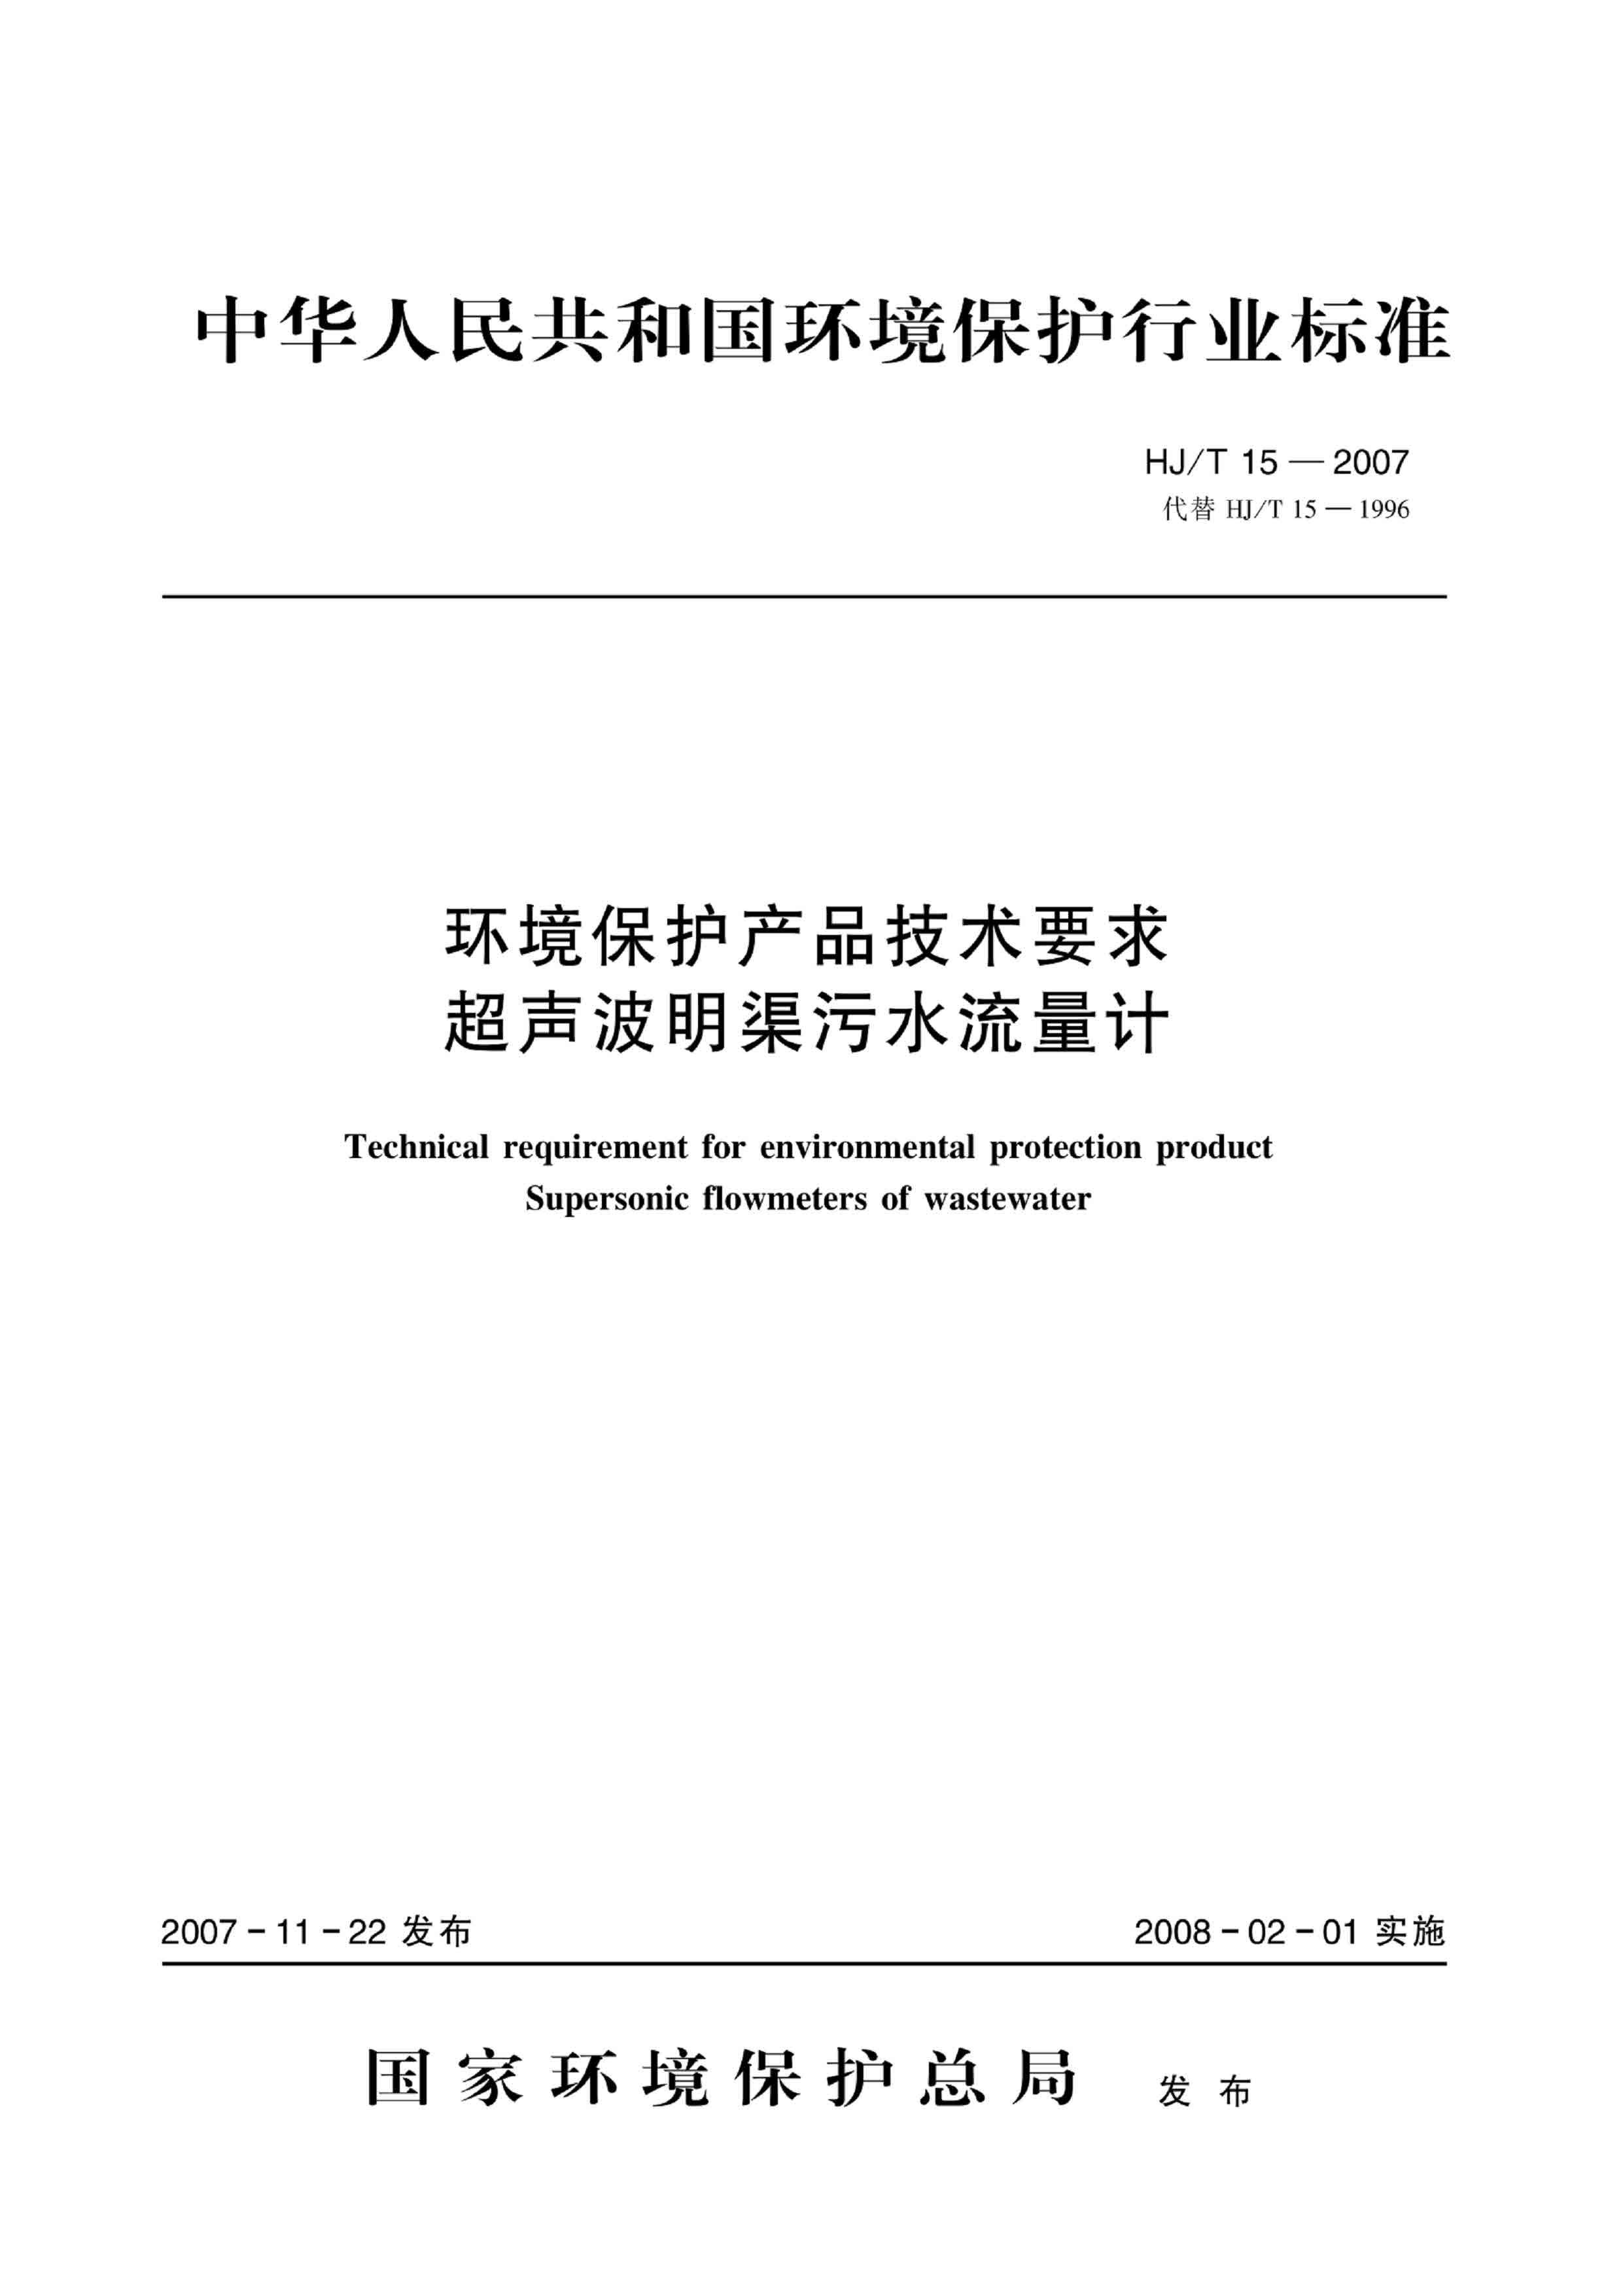 HJ-T15-2007 环境保护产品技术要求 超声波明渠污水流量计 下载(19新版已出)